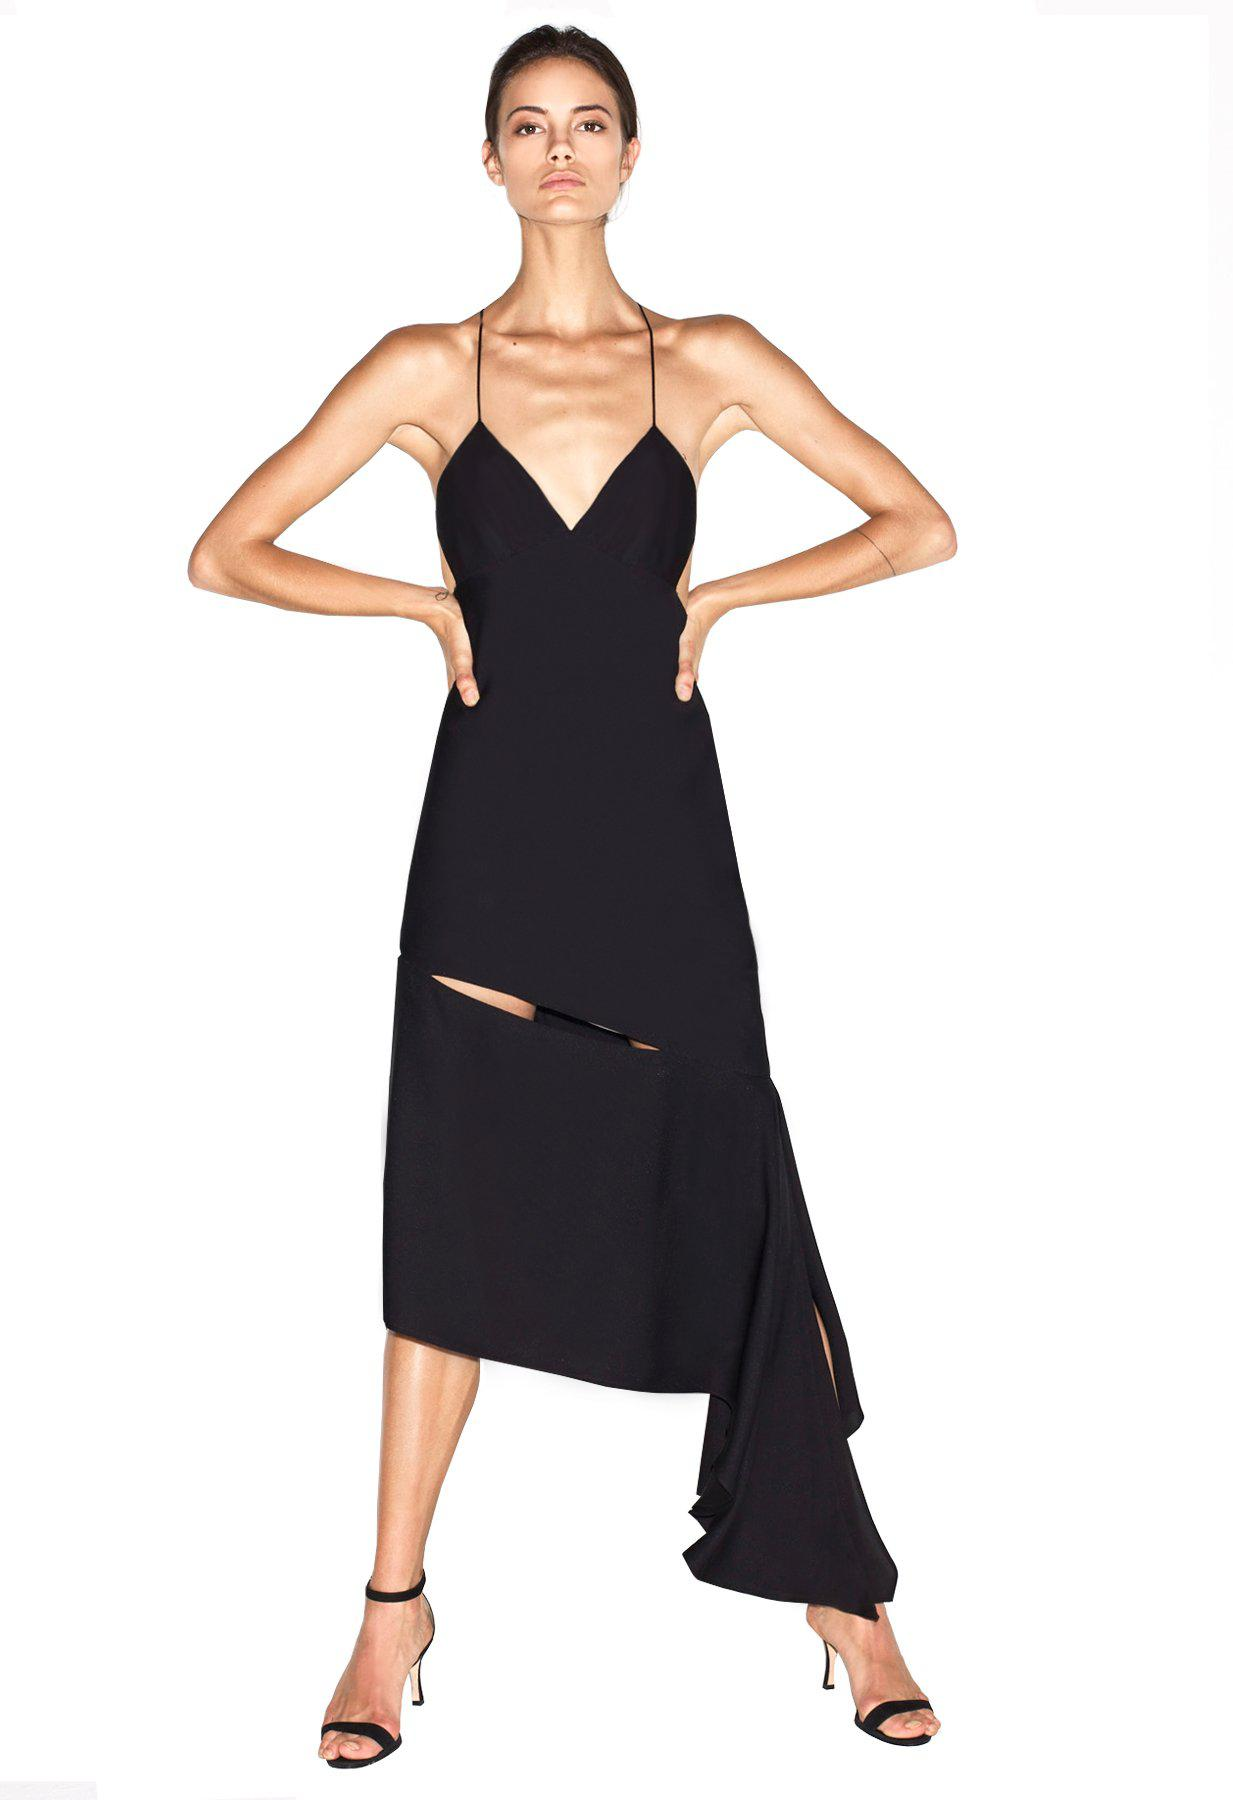 a3bf535fdf0a7 Lyst - MILLY Stretch Silk Fractured Bias Slipdress in Black